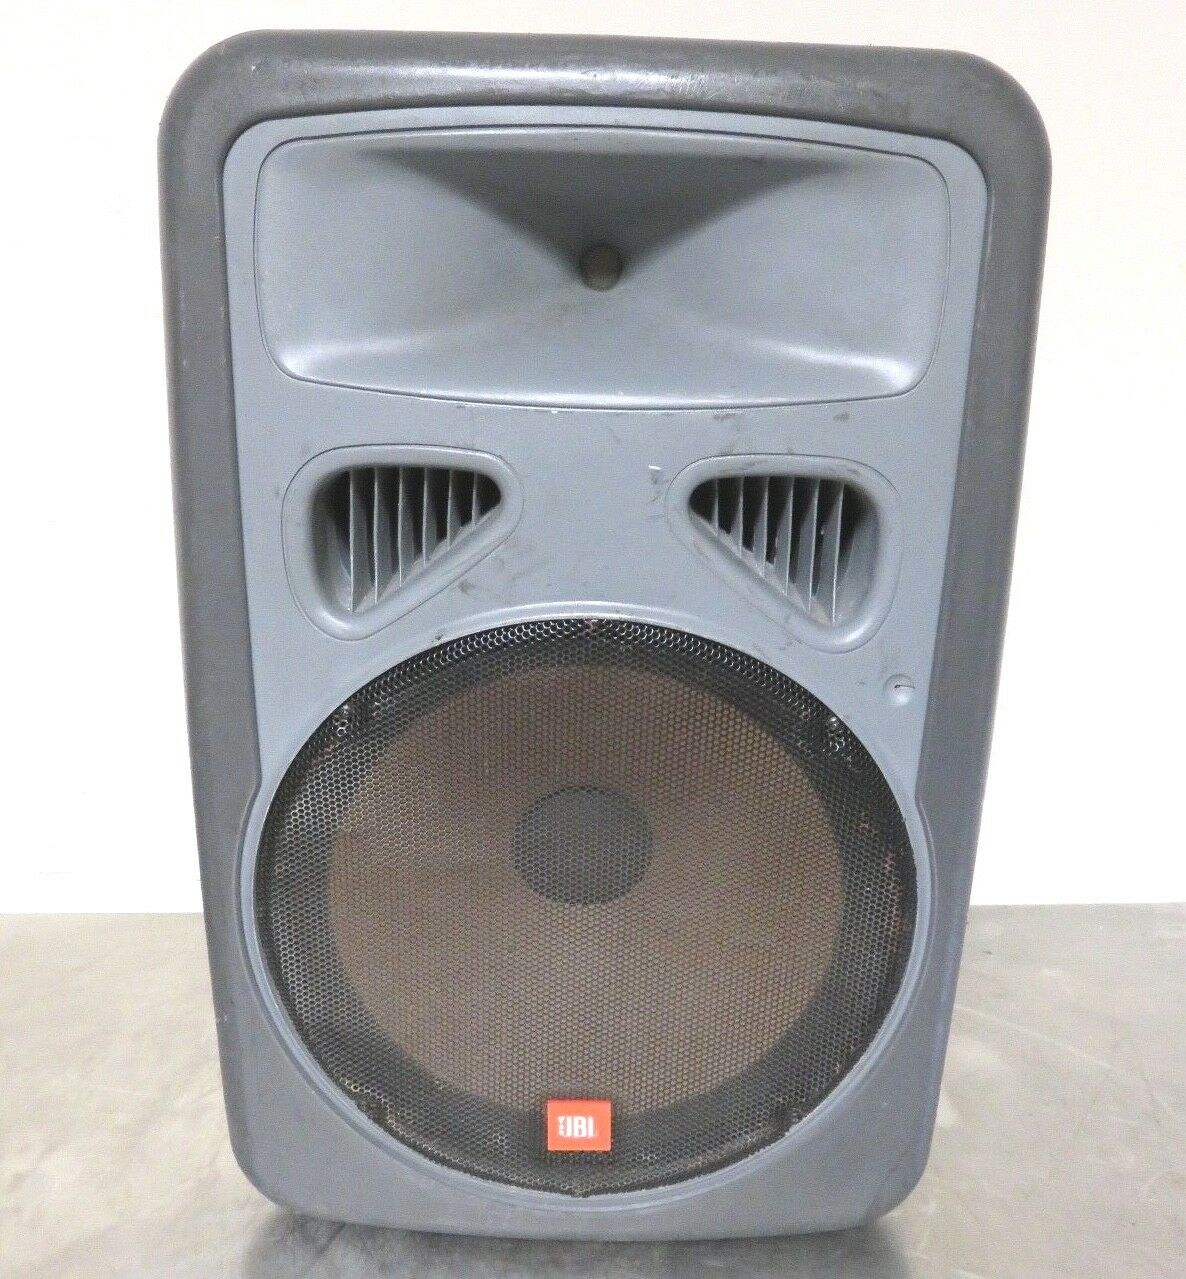 JBL Eon 15 Powerot Powerot Powerot Speaker- Great working 61d5d8